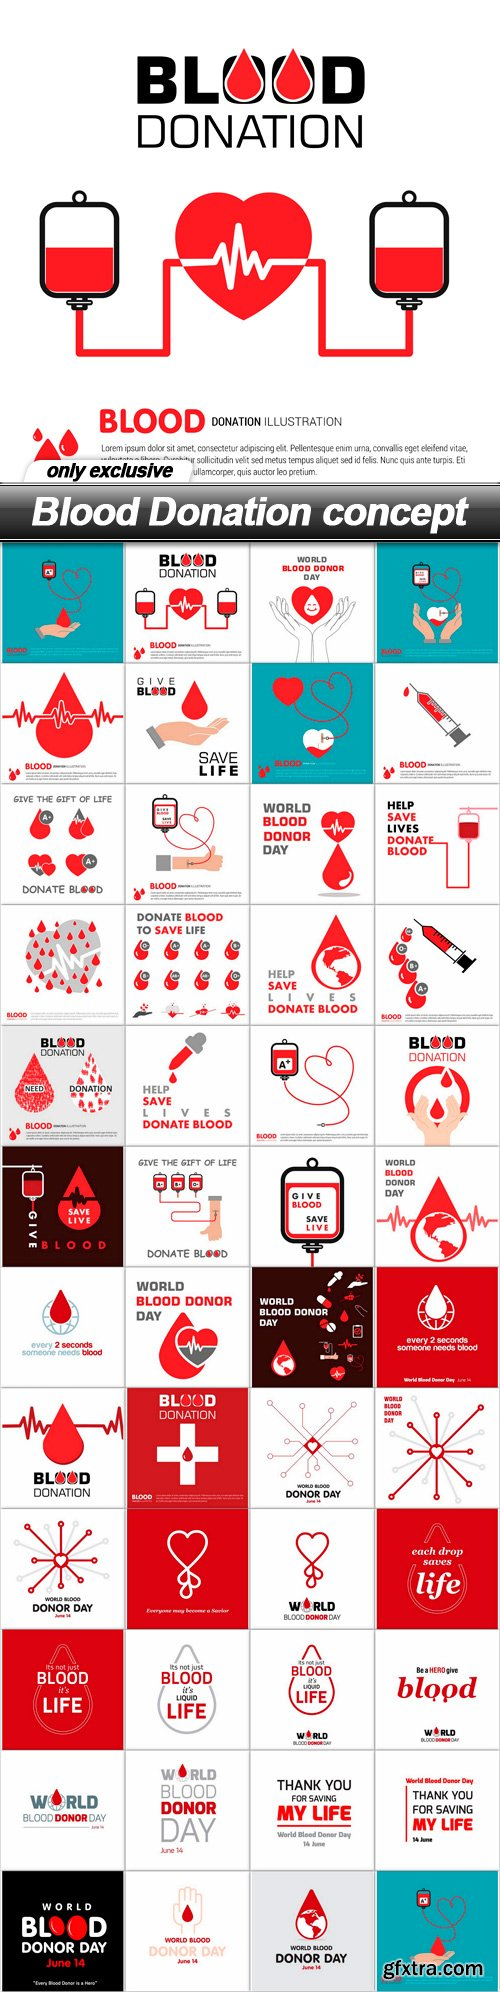 Blood Donation concept - 47 EPS